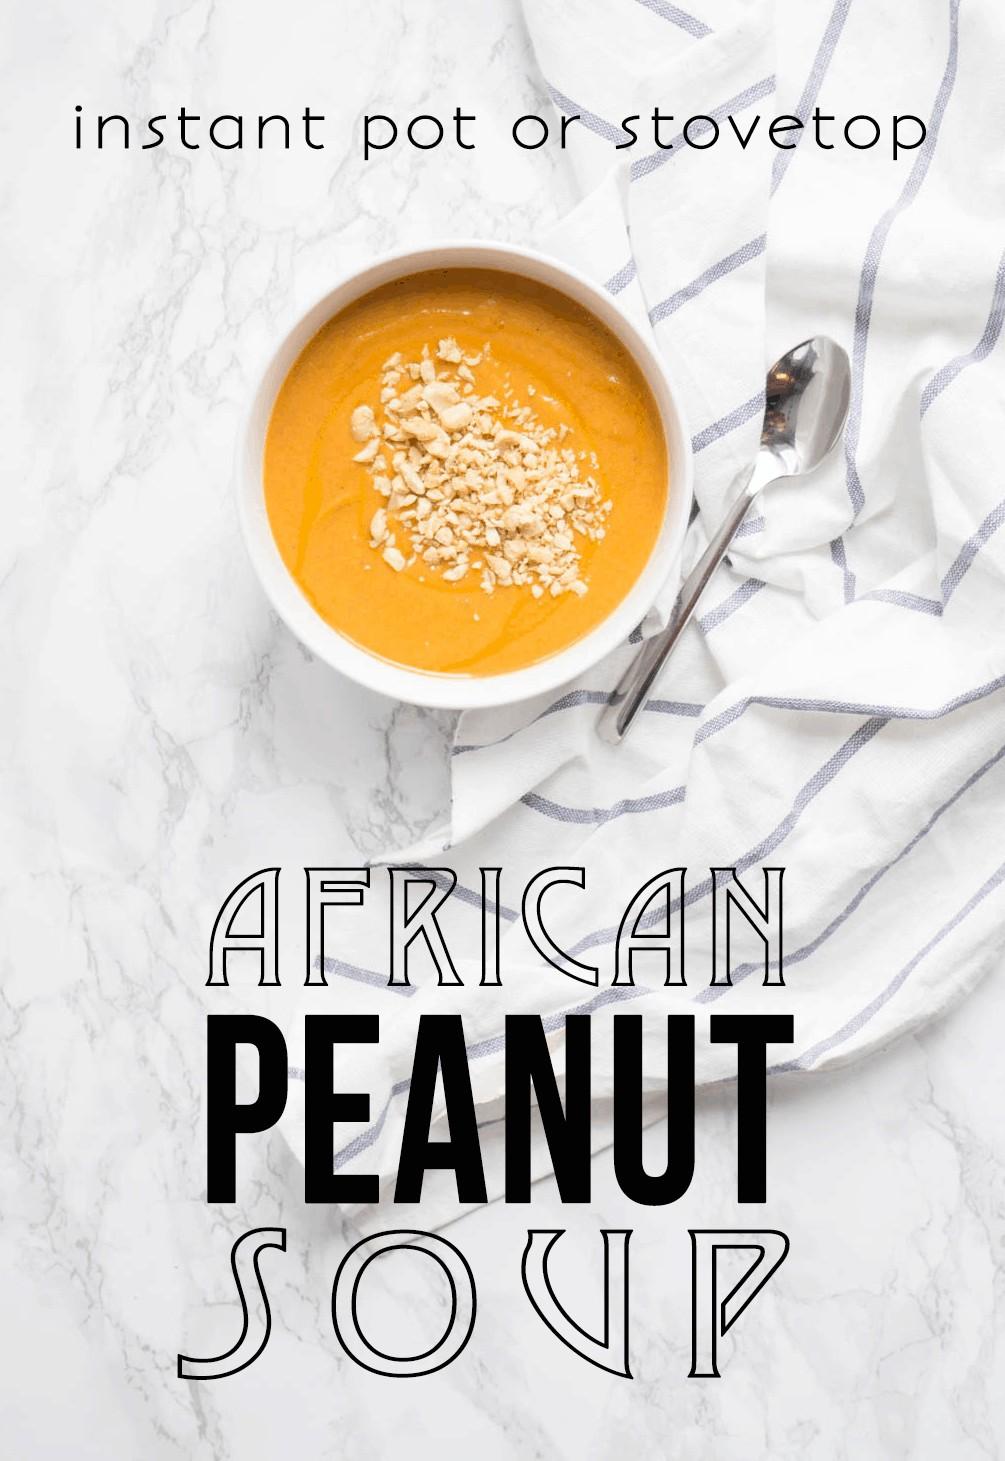 African Peanut Soup (Instant Pot or Stovetop) - #glutenfreerecipes #glutenfree #glutenfreesoup #vegan #veganrecipes #vegansoup #antiinflammatory #soup #souprecipes #instantpot #instantpotsoup #instantpotrecipes